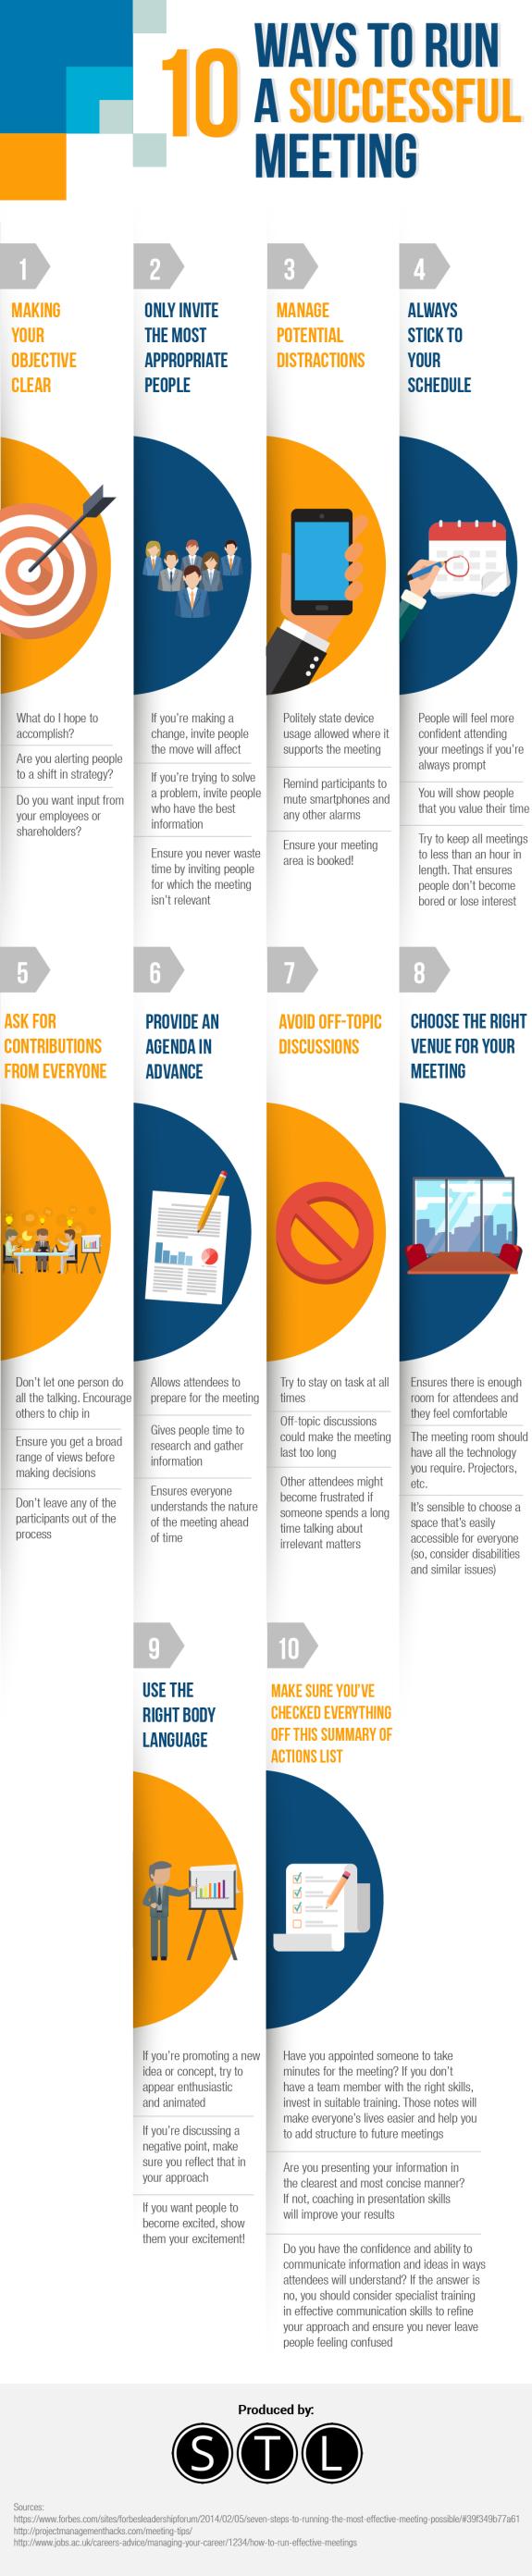 Ten Ways to Run a Successful Meeting